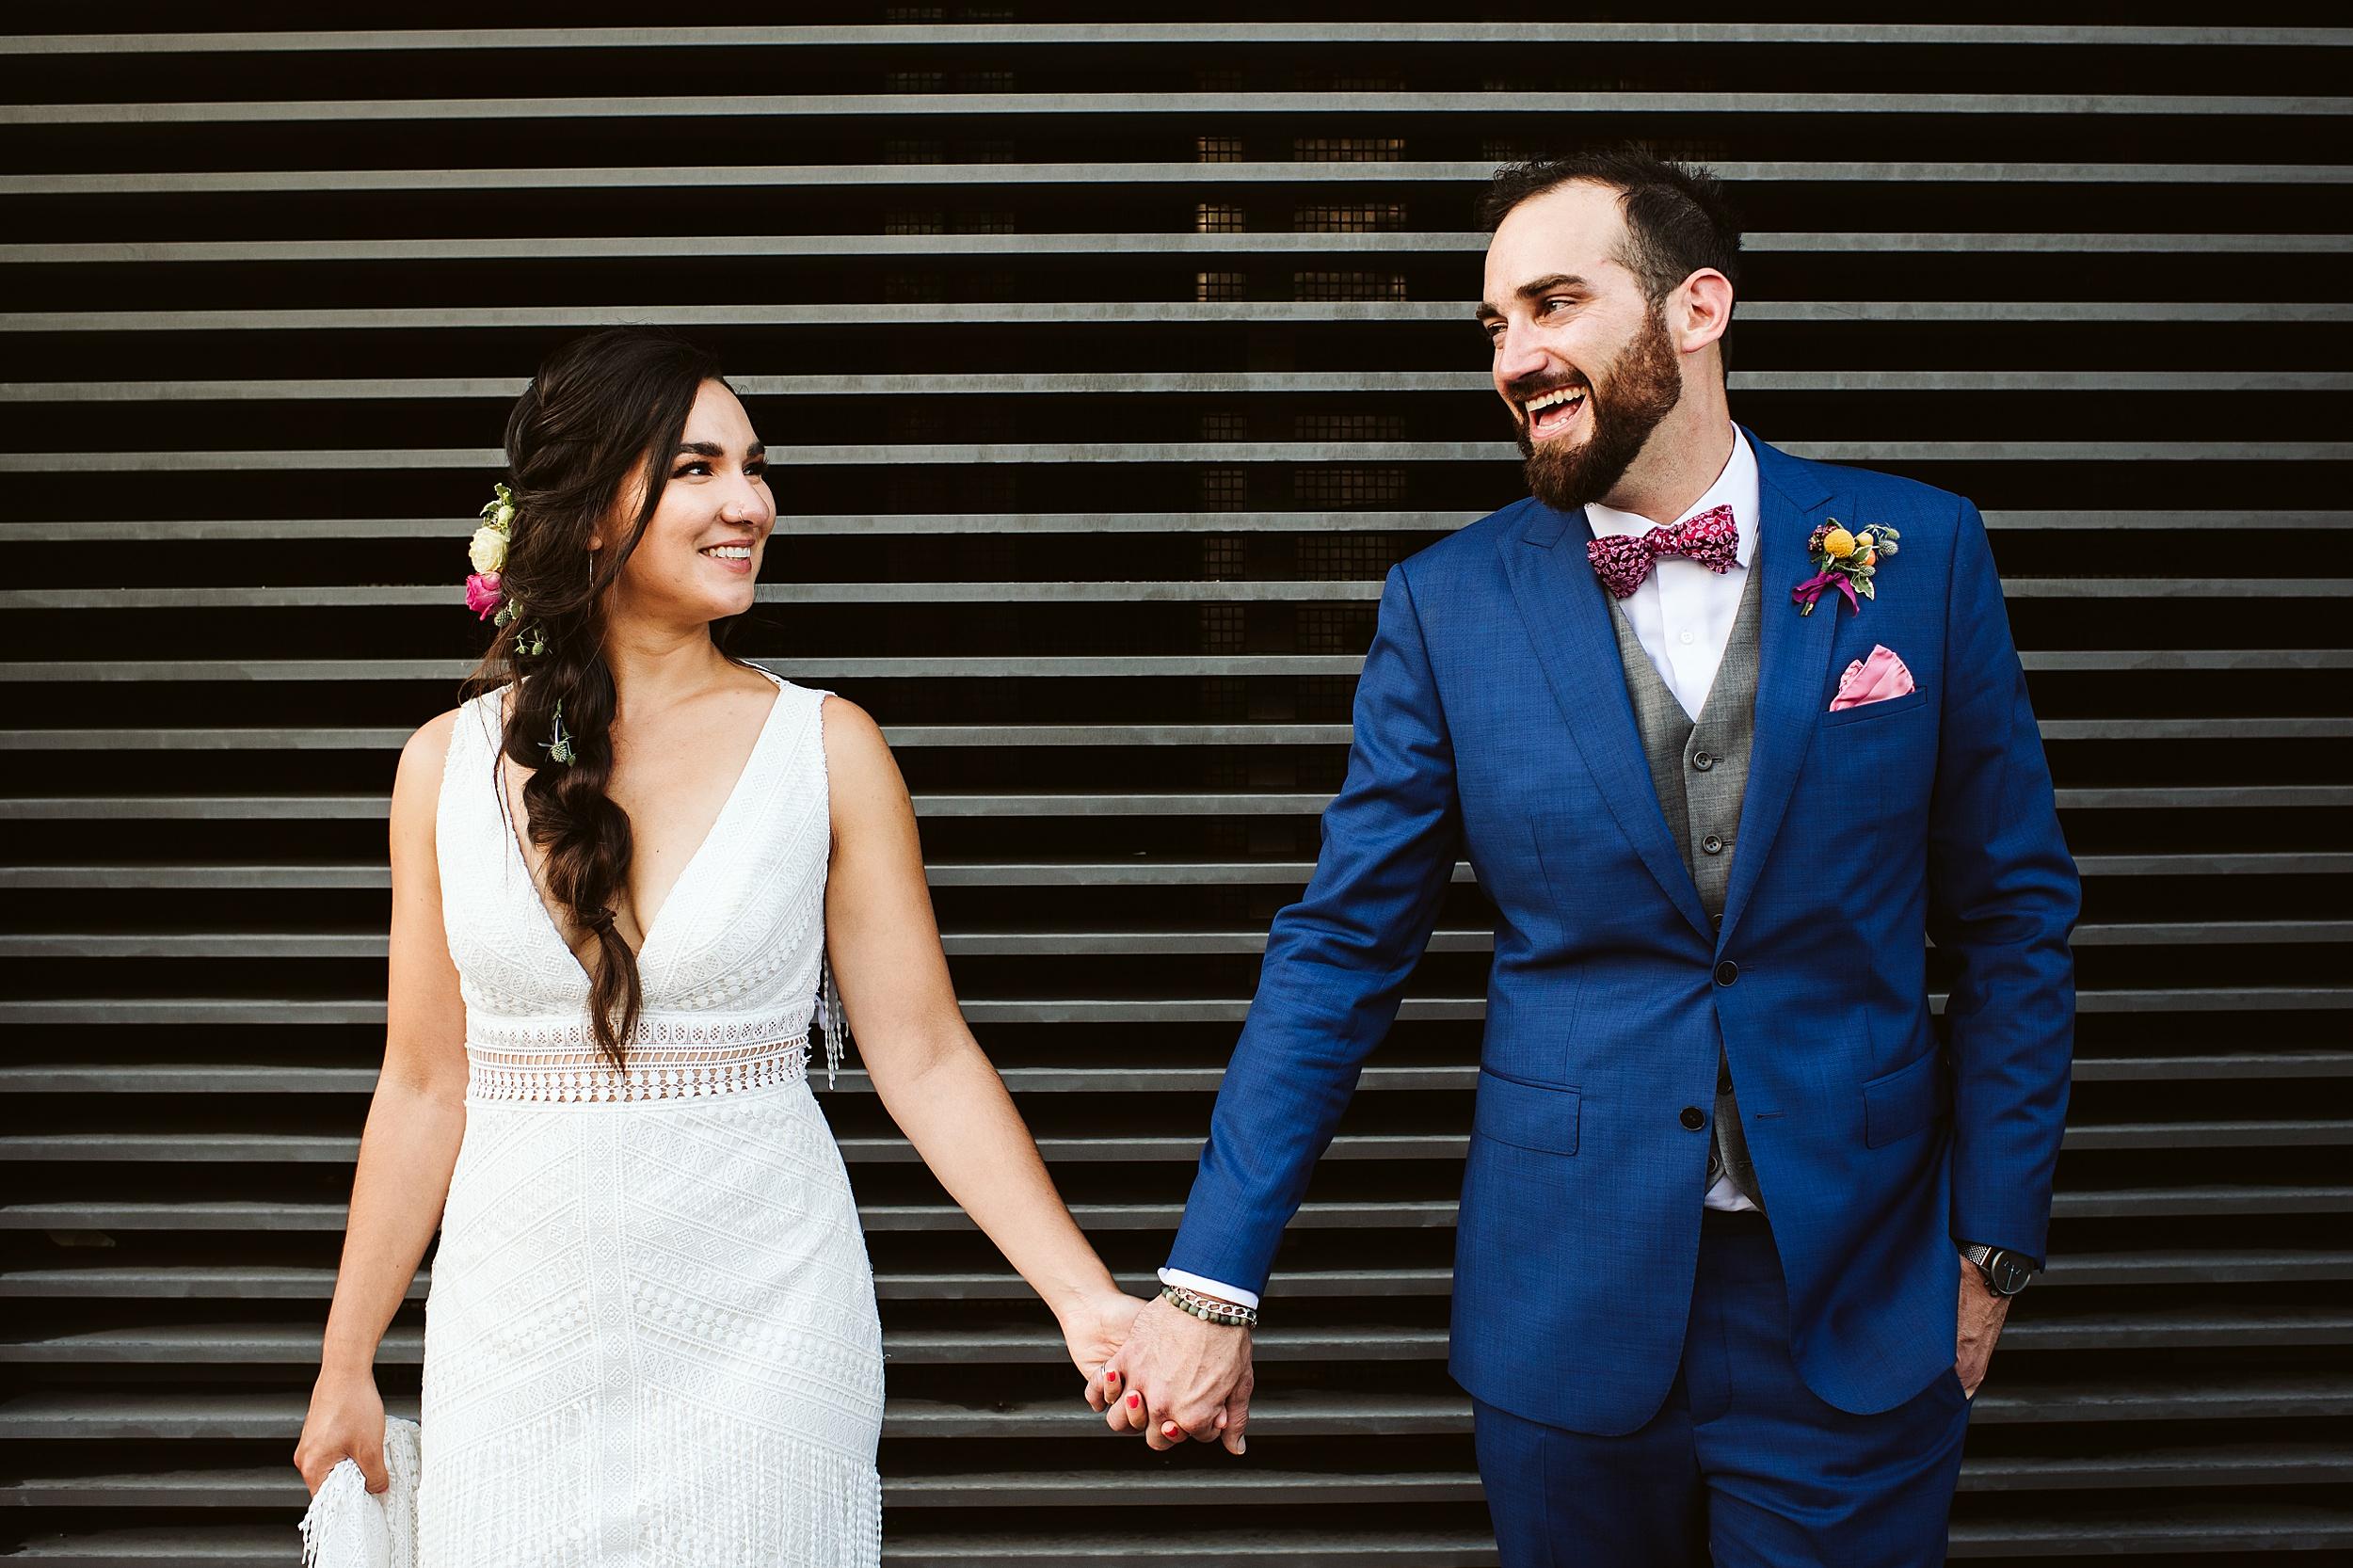 Airship-37-Berkeley-Events-Distillery-District-Wedding-Toronto-Wedding-Photographers_0041.jpg